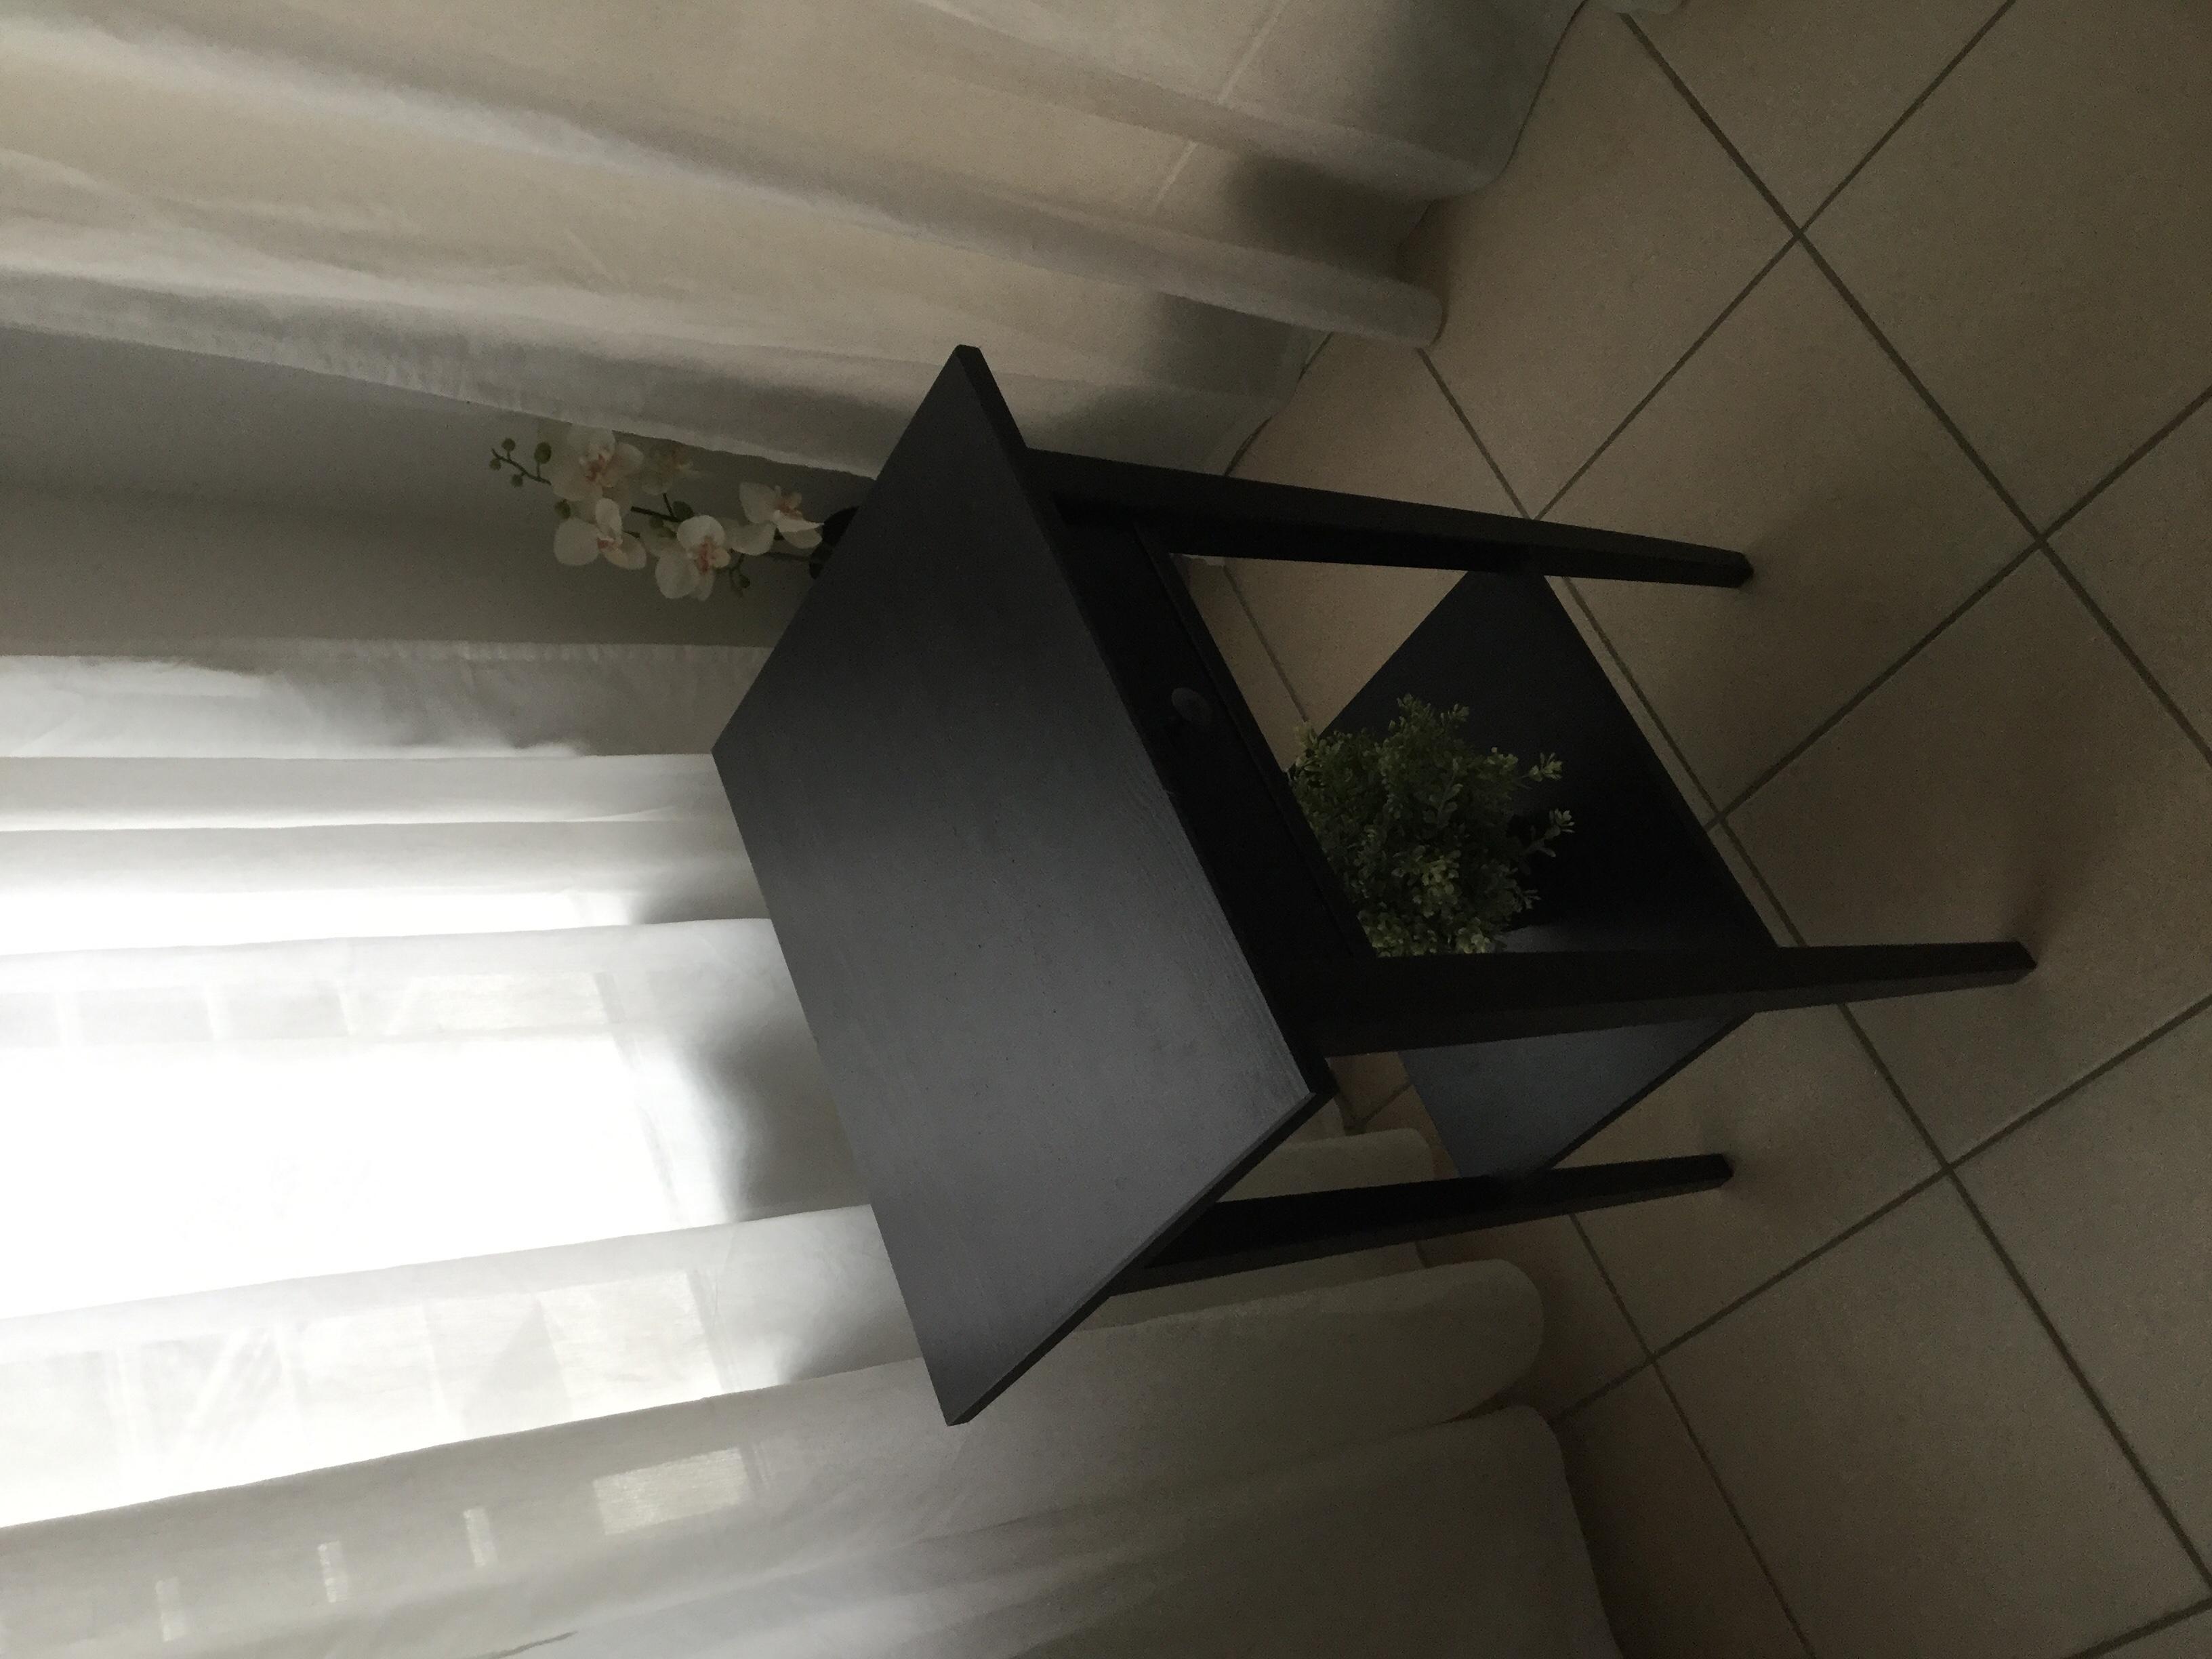 table de chevet ikea hemnes meubles with hemnes table de chevet. Black Bedroom Furniture Sets. Home Design Ideas